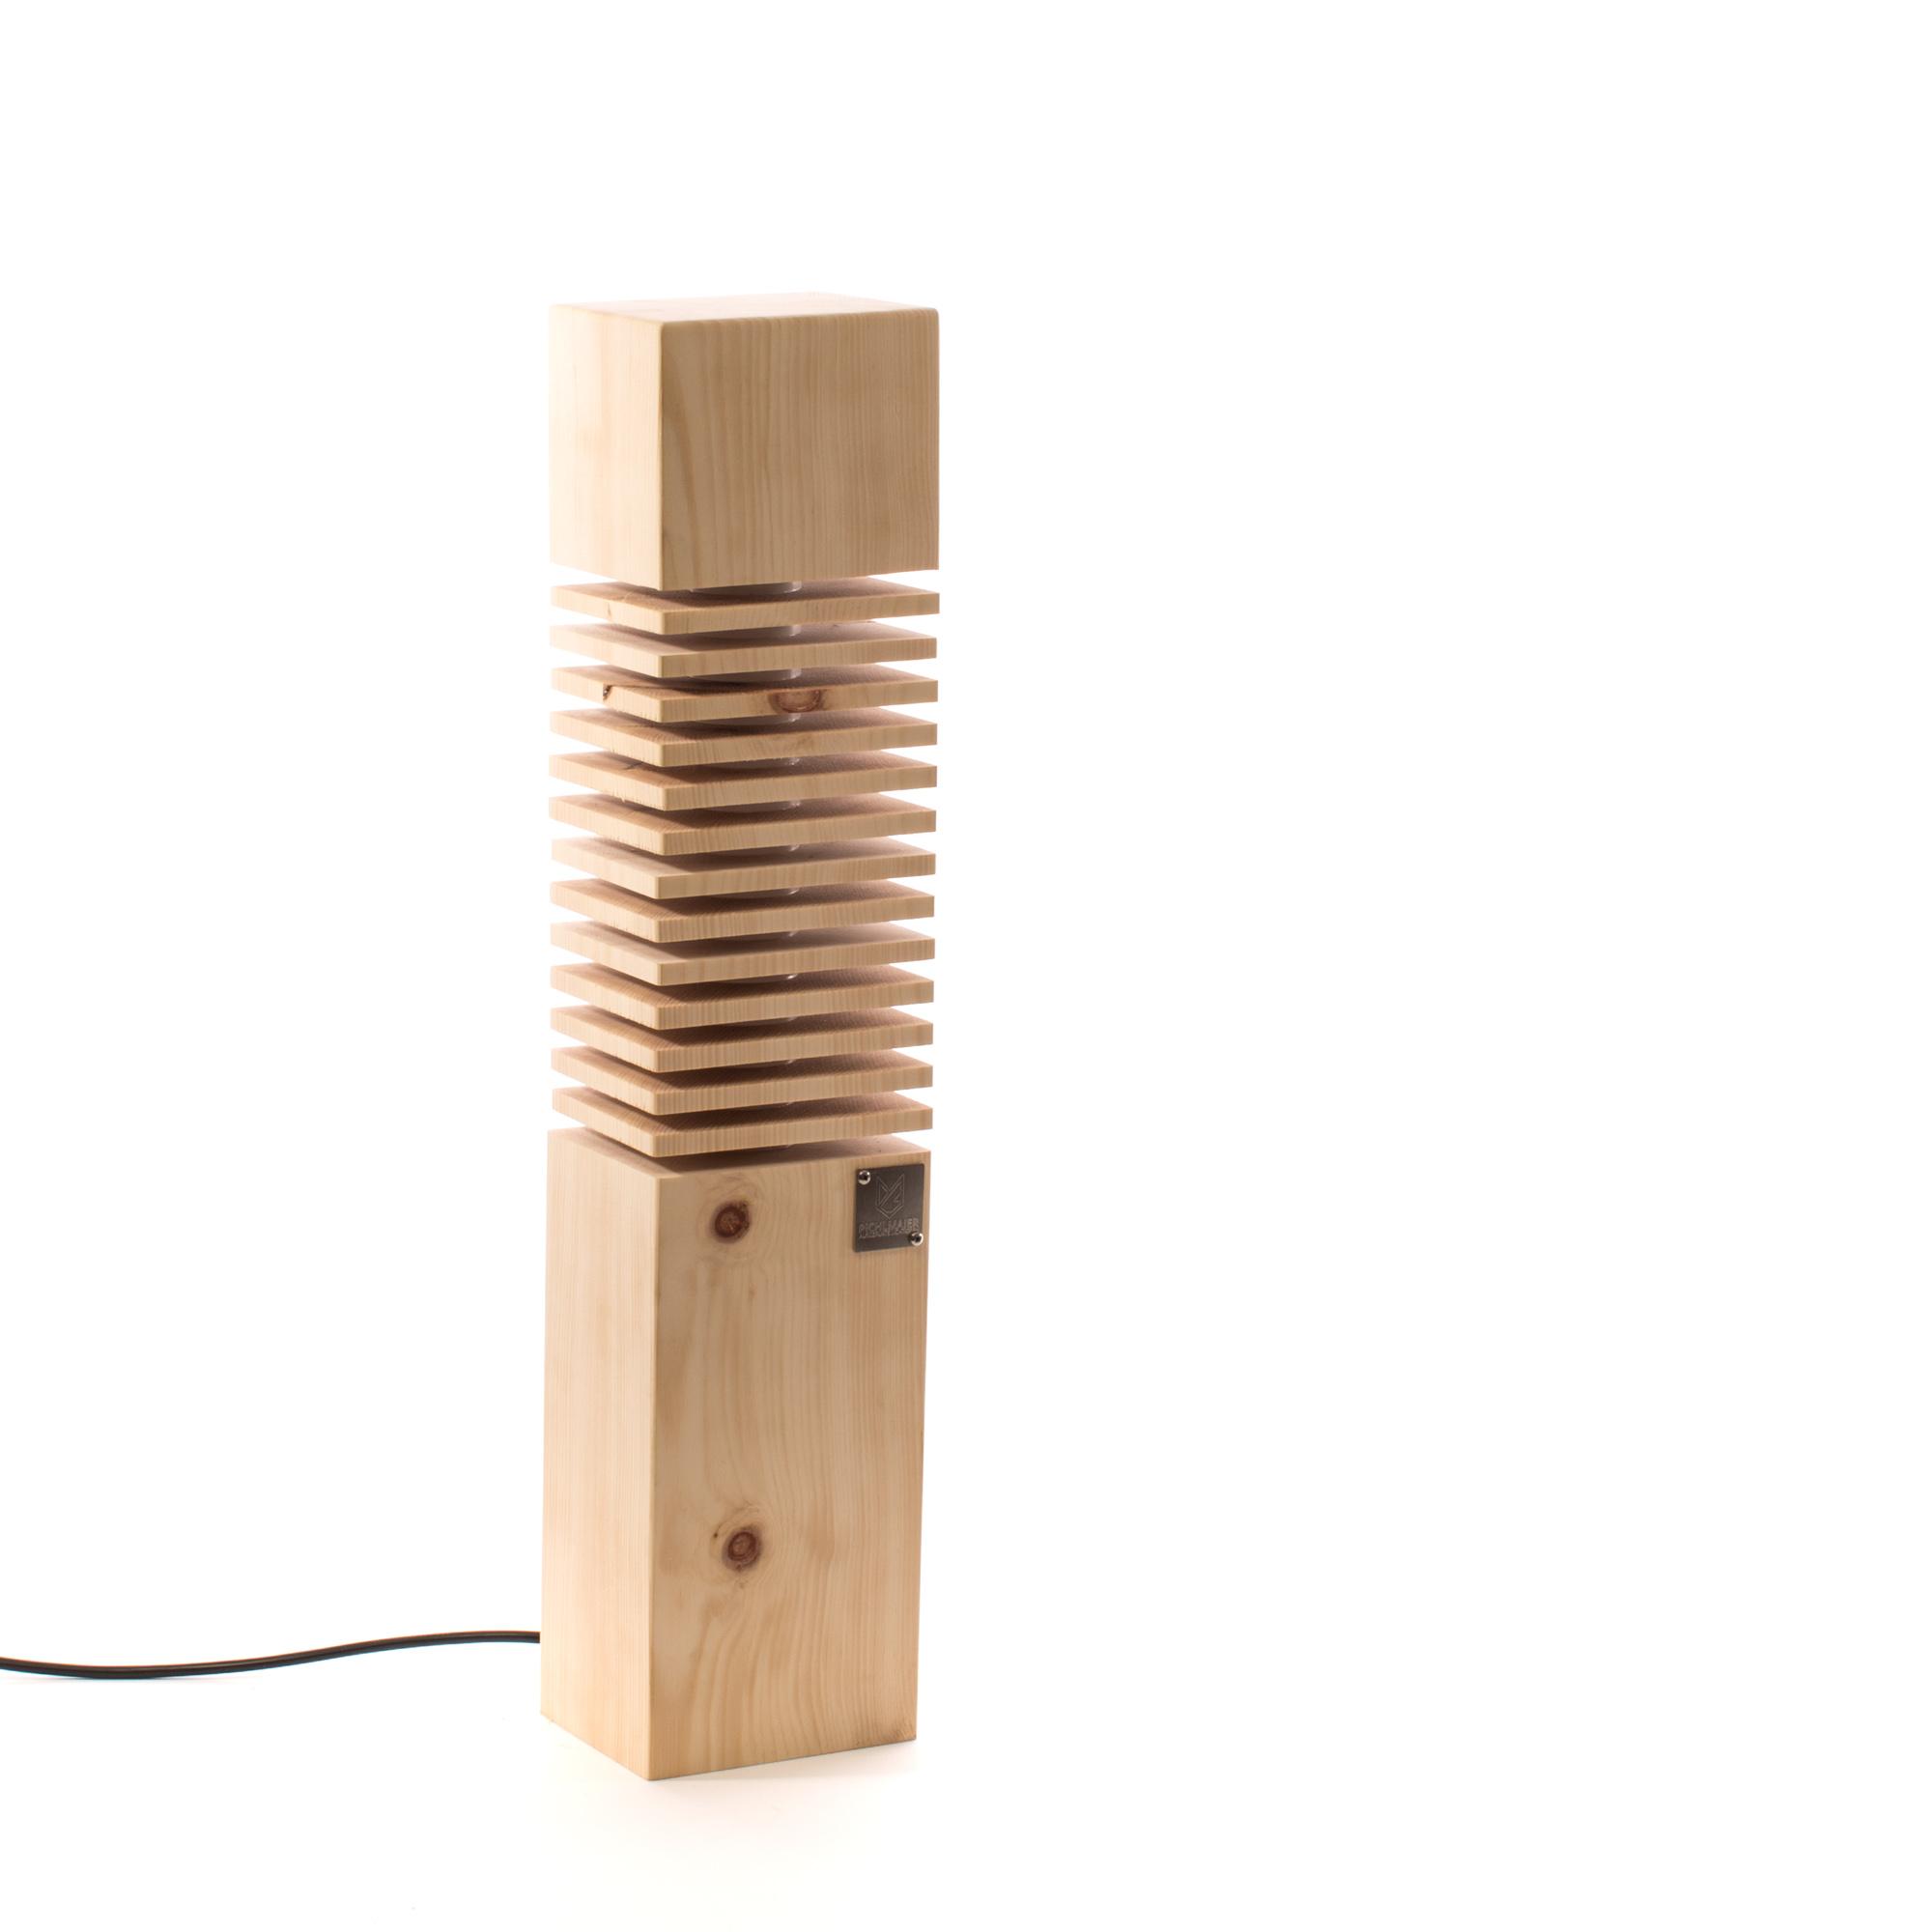 zirbe klein pichlmaier lampen onlinestore f r led lampen aus holz. Black Bedroom Furniture Sets. Home Design Ideas